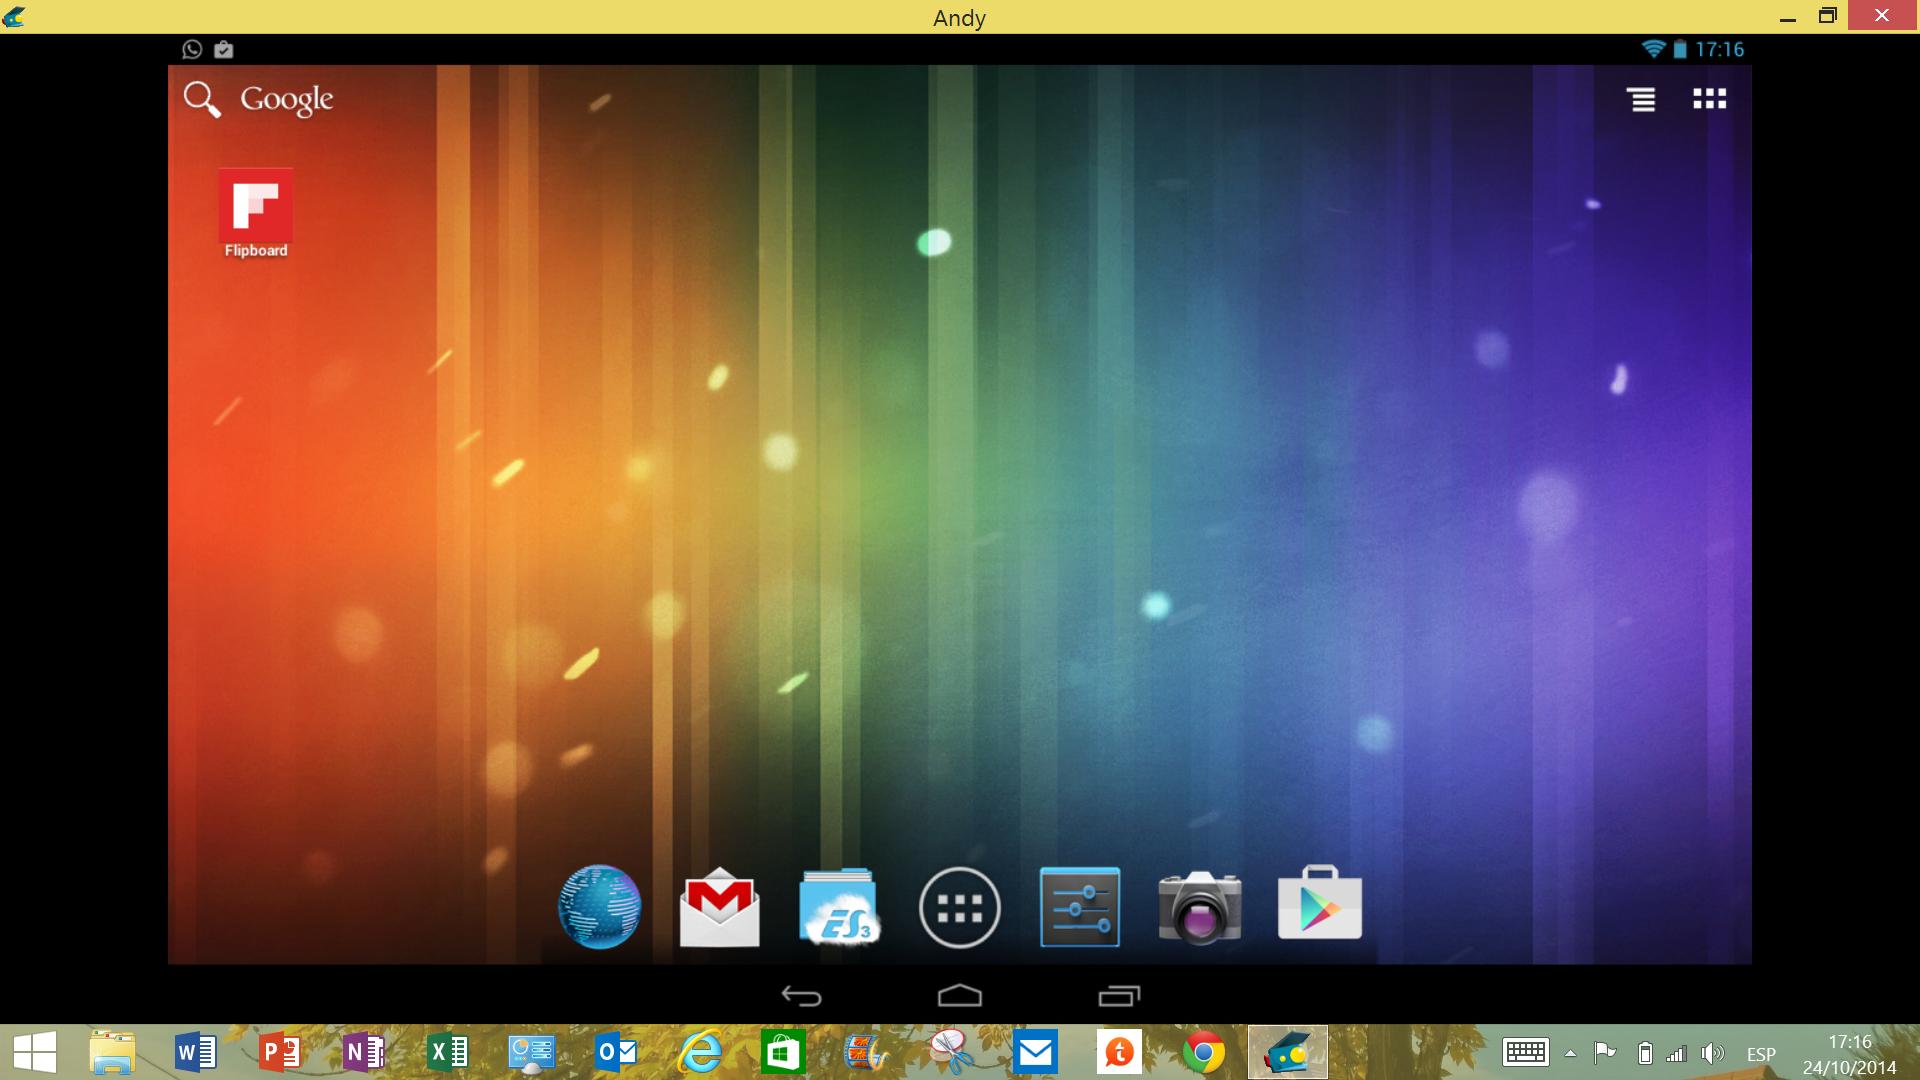 android en windows 8 1 con andy josu sierra s blog bloga